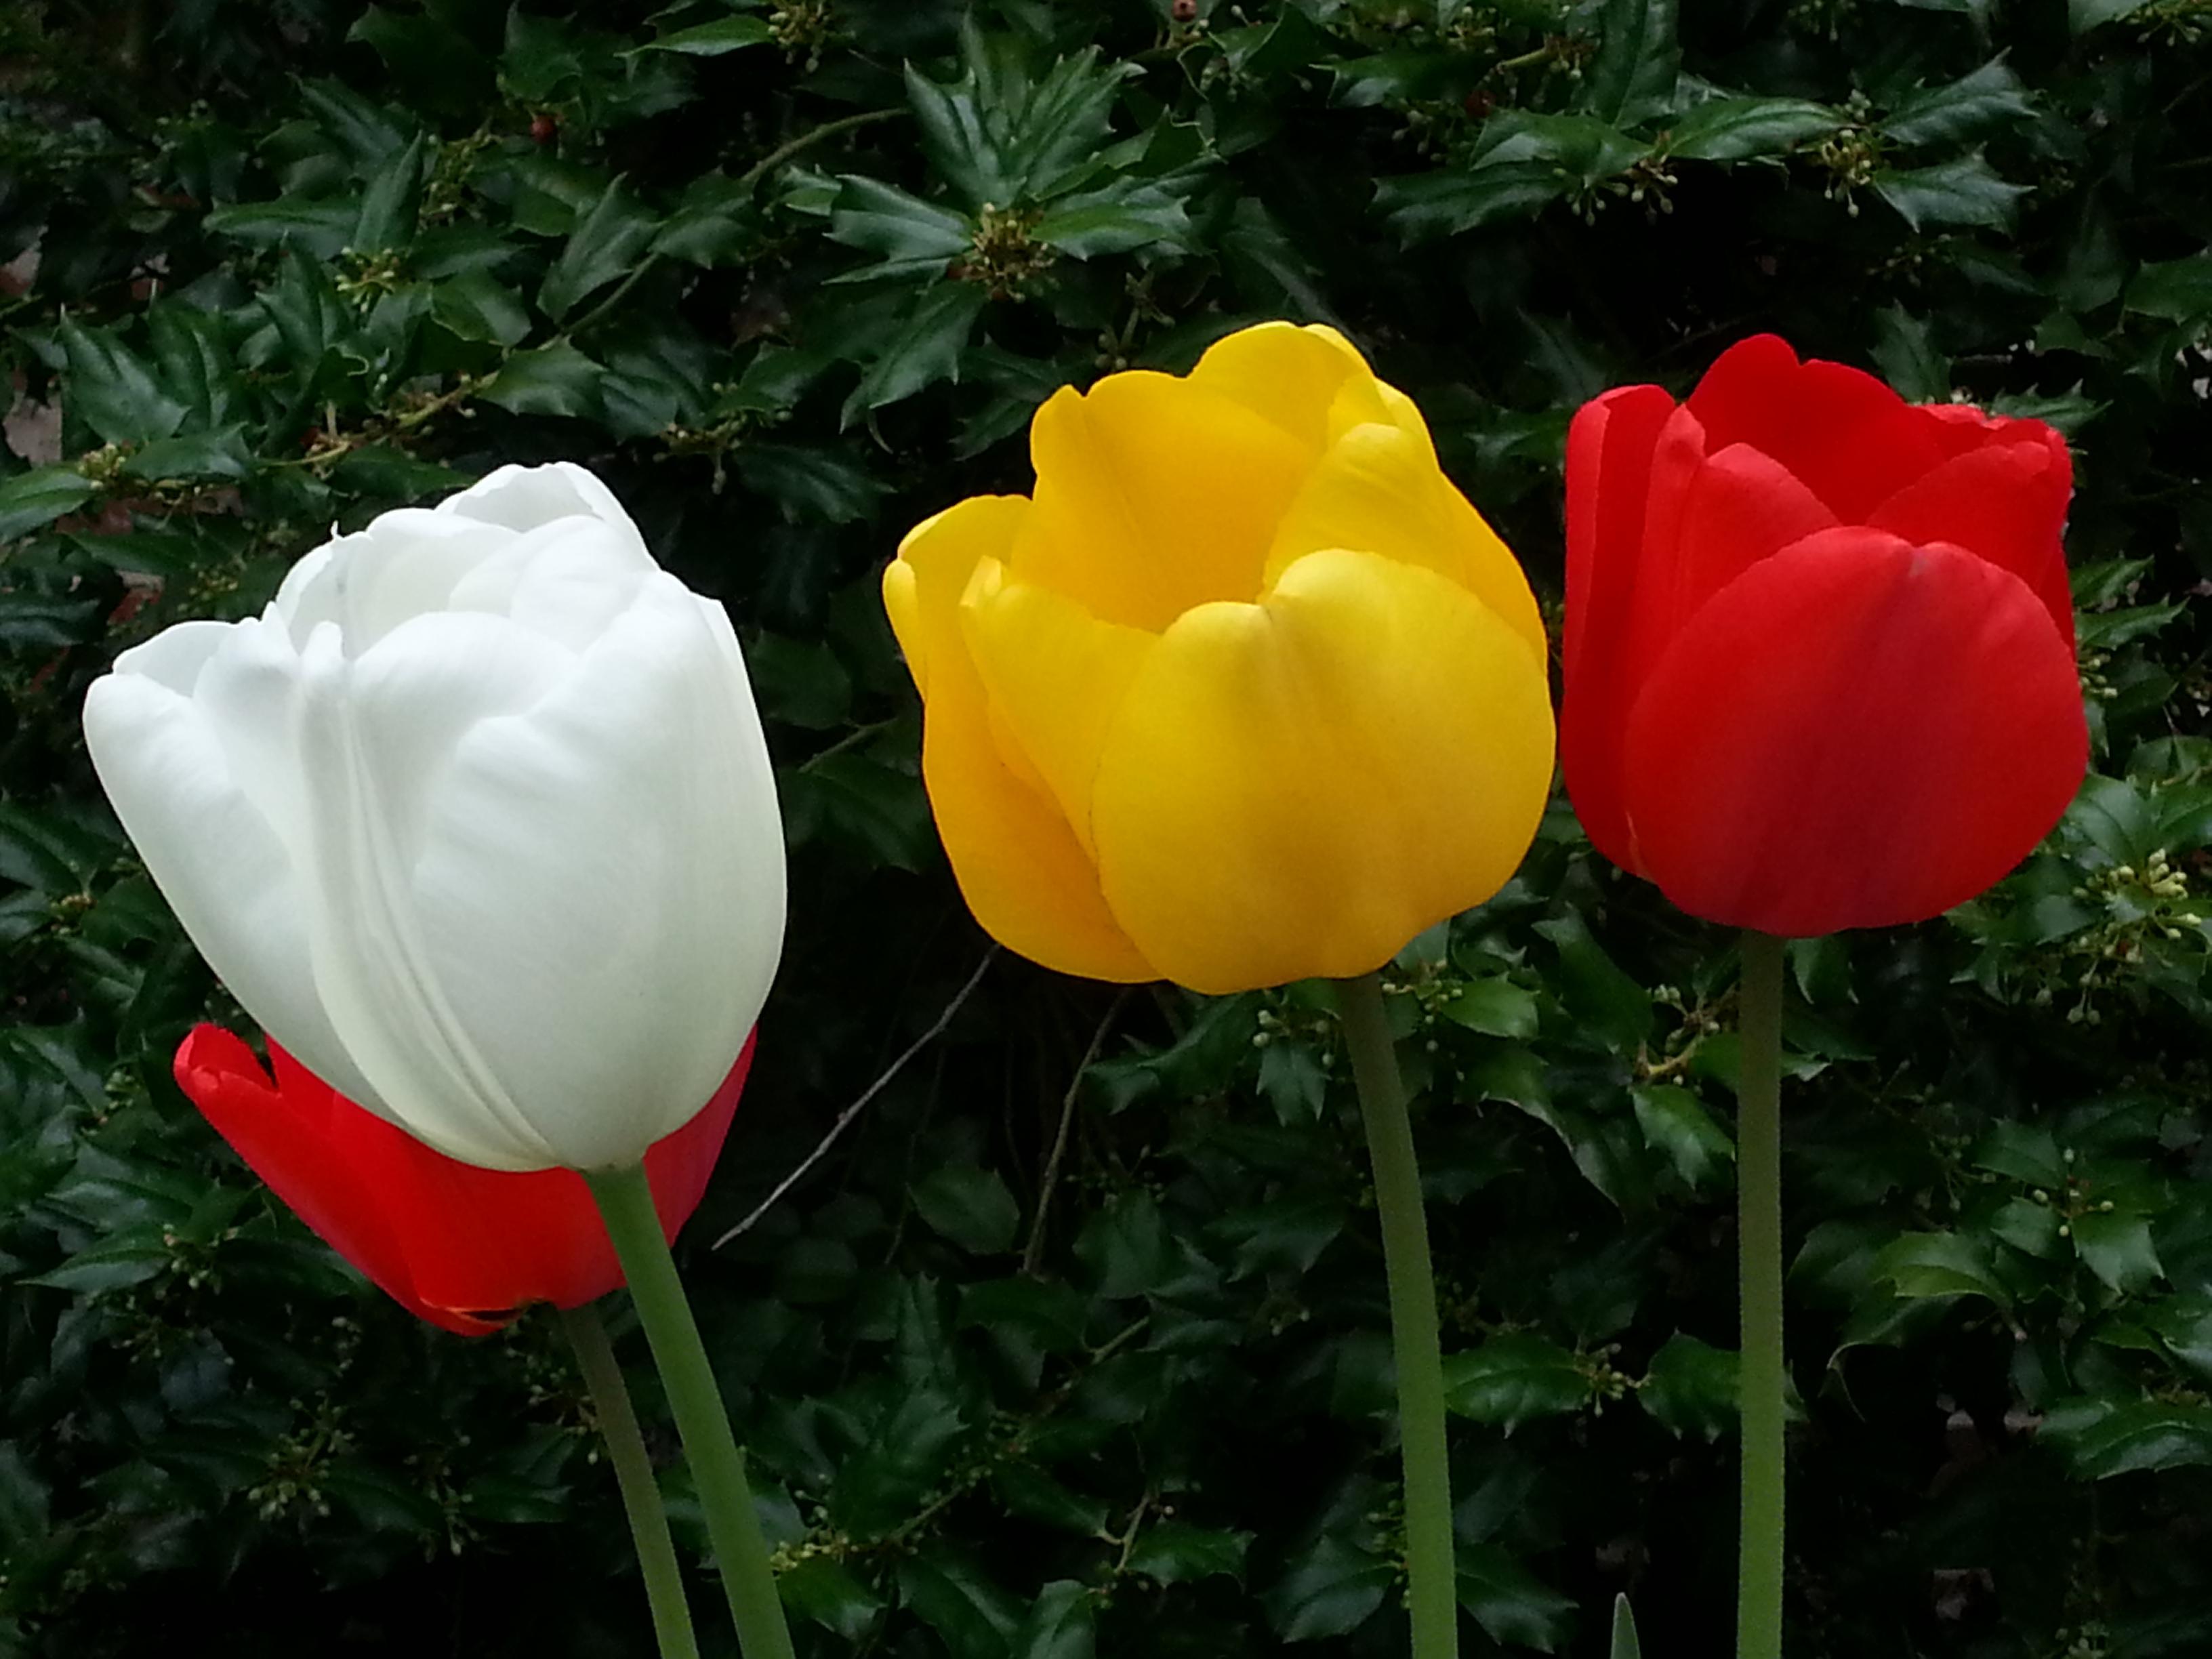 Very Nice Flowers Part Of Getting Is